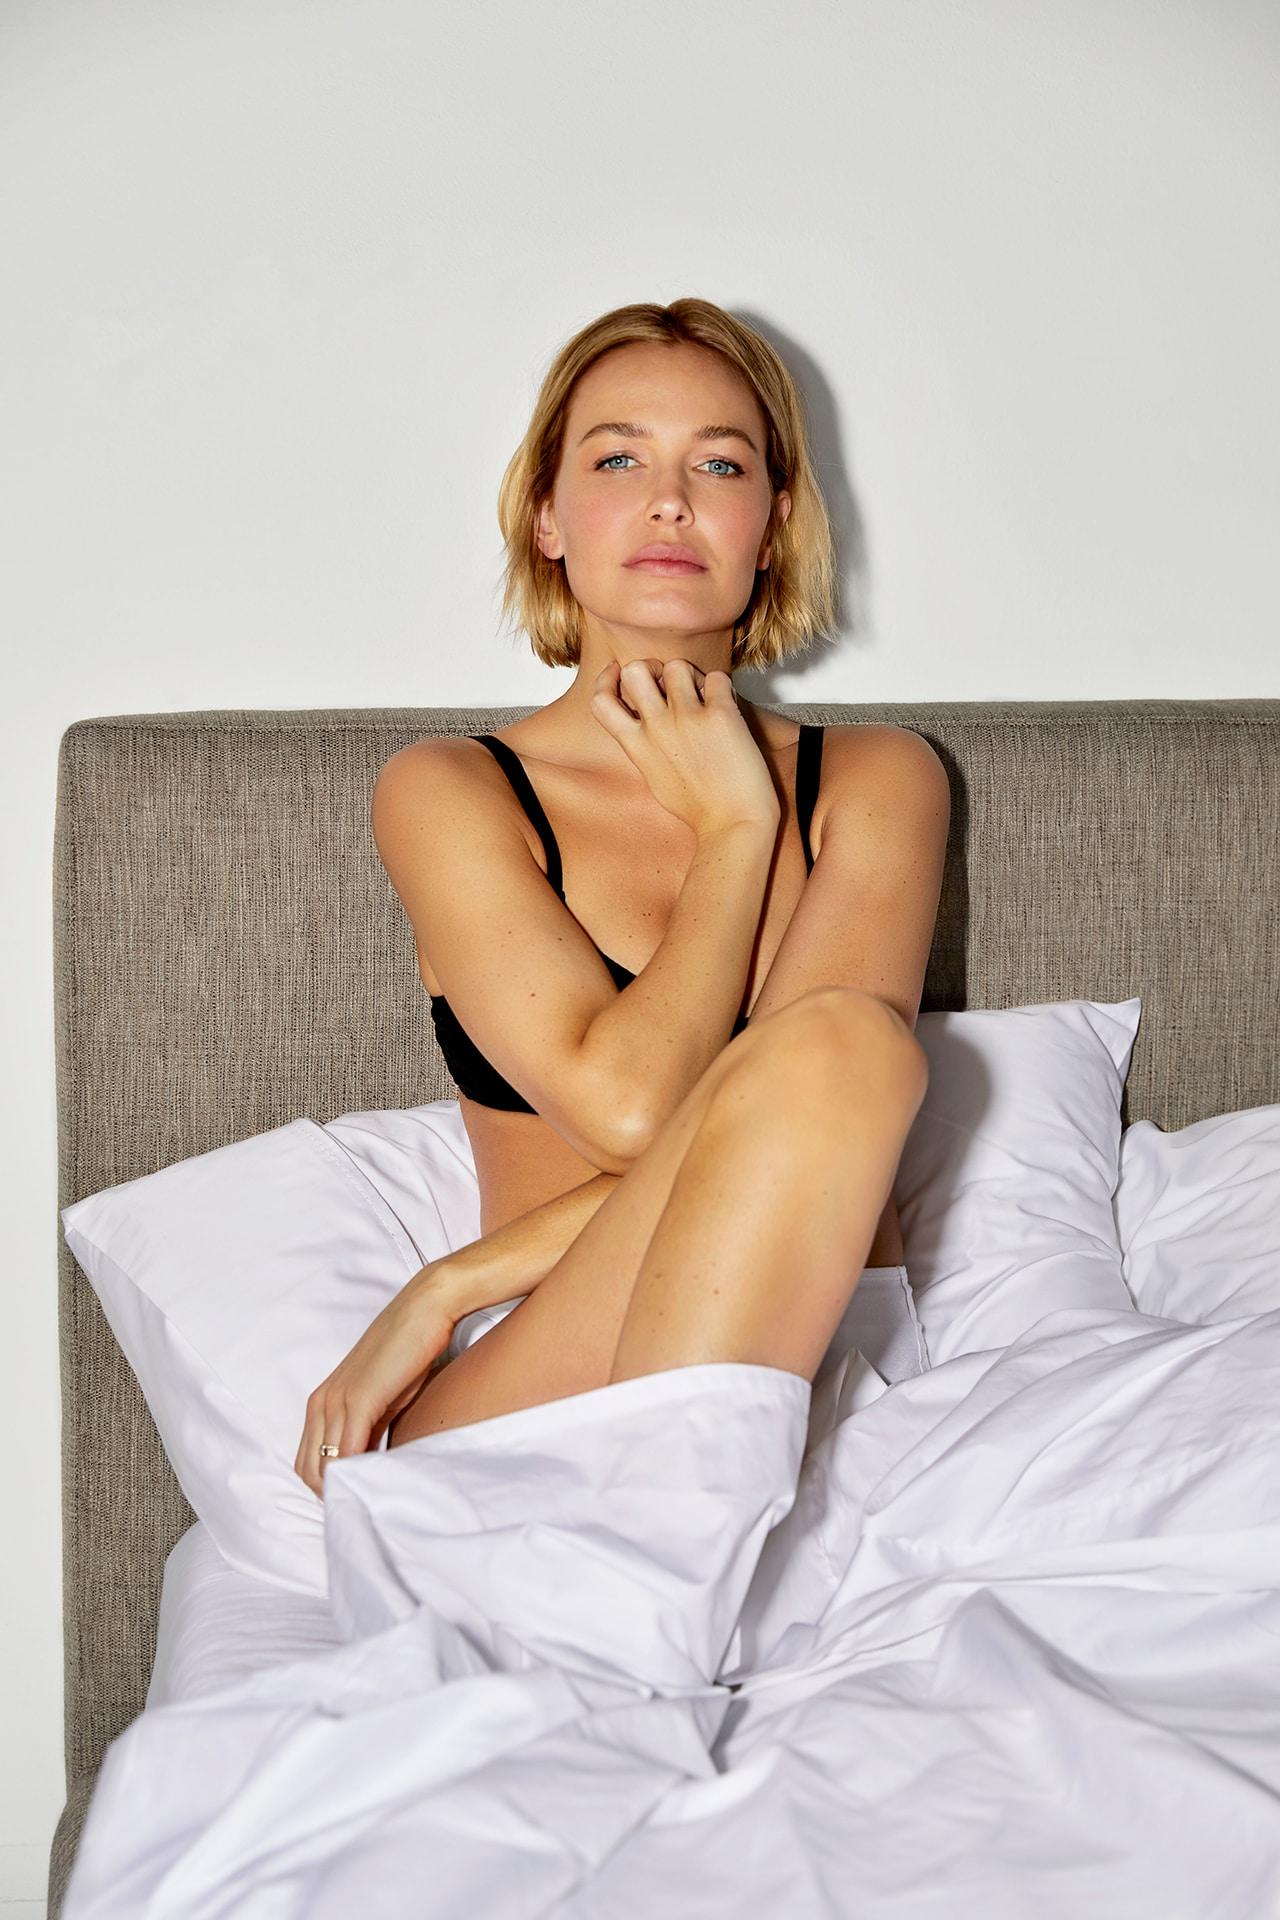 Lara Worthington on bedtime, beauty secrets and her interior style